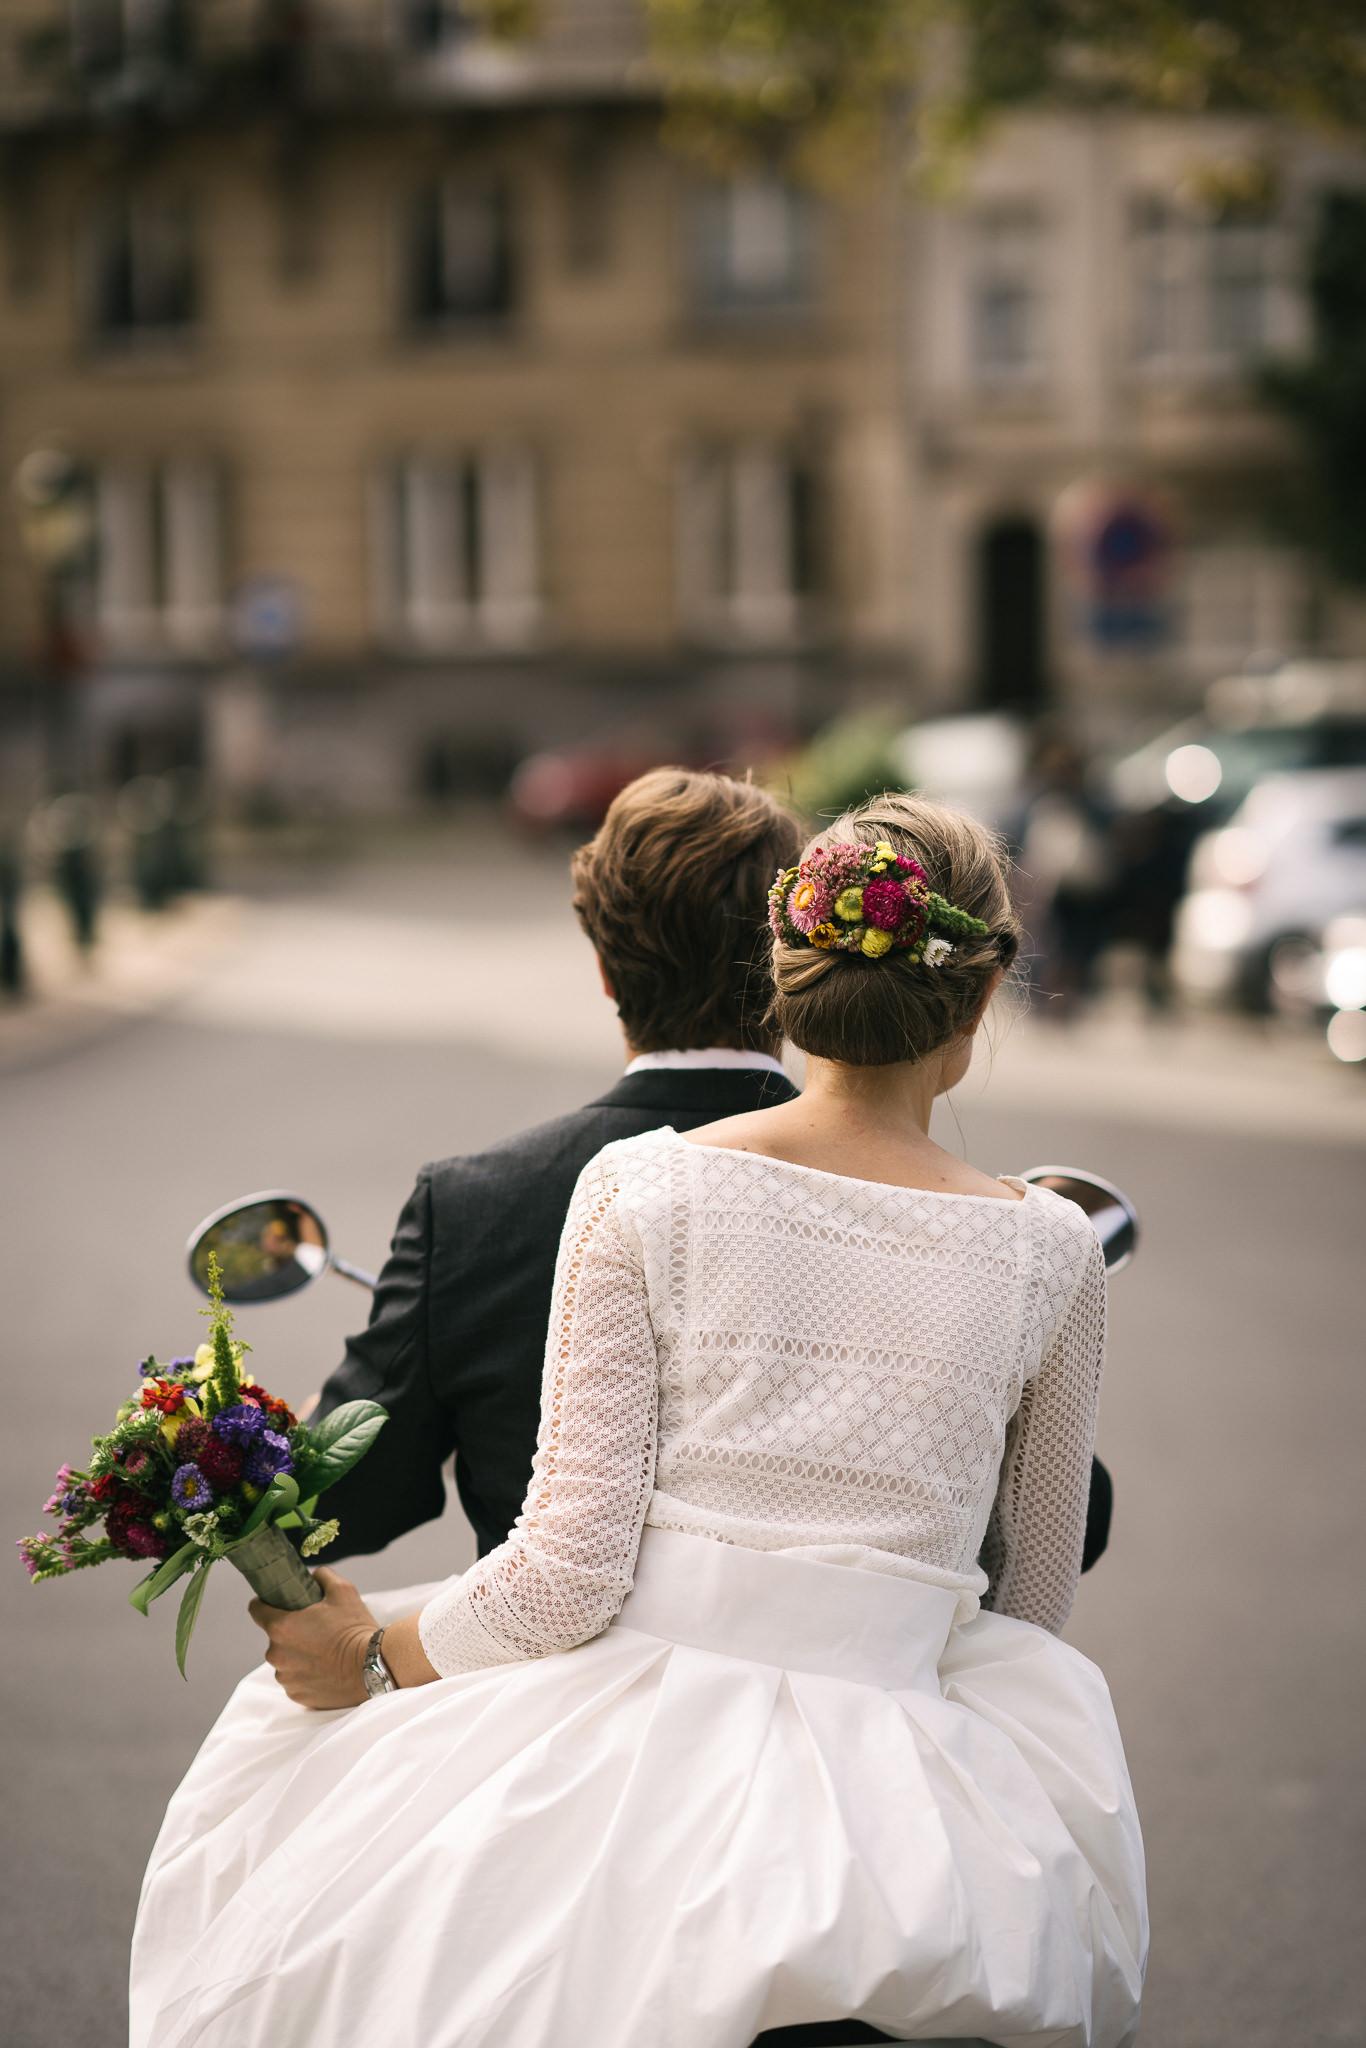 Wedding-Claudia&Philipp-15092018-small-118.jpg